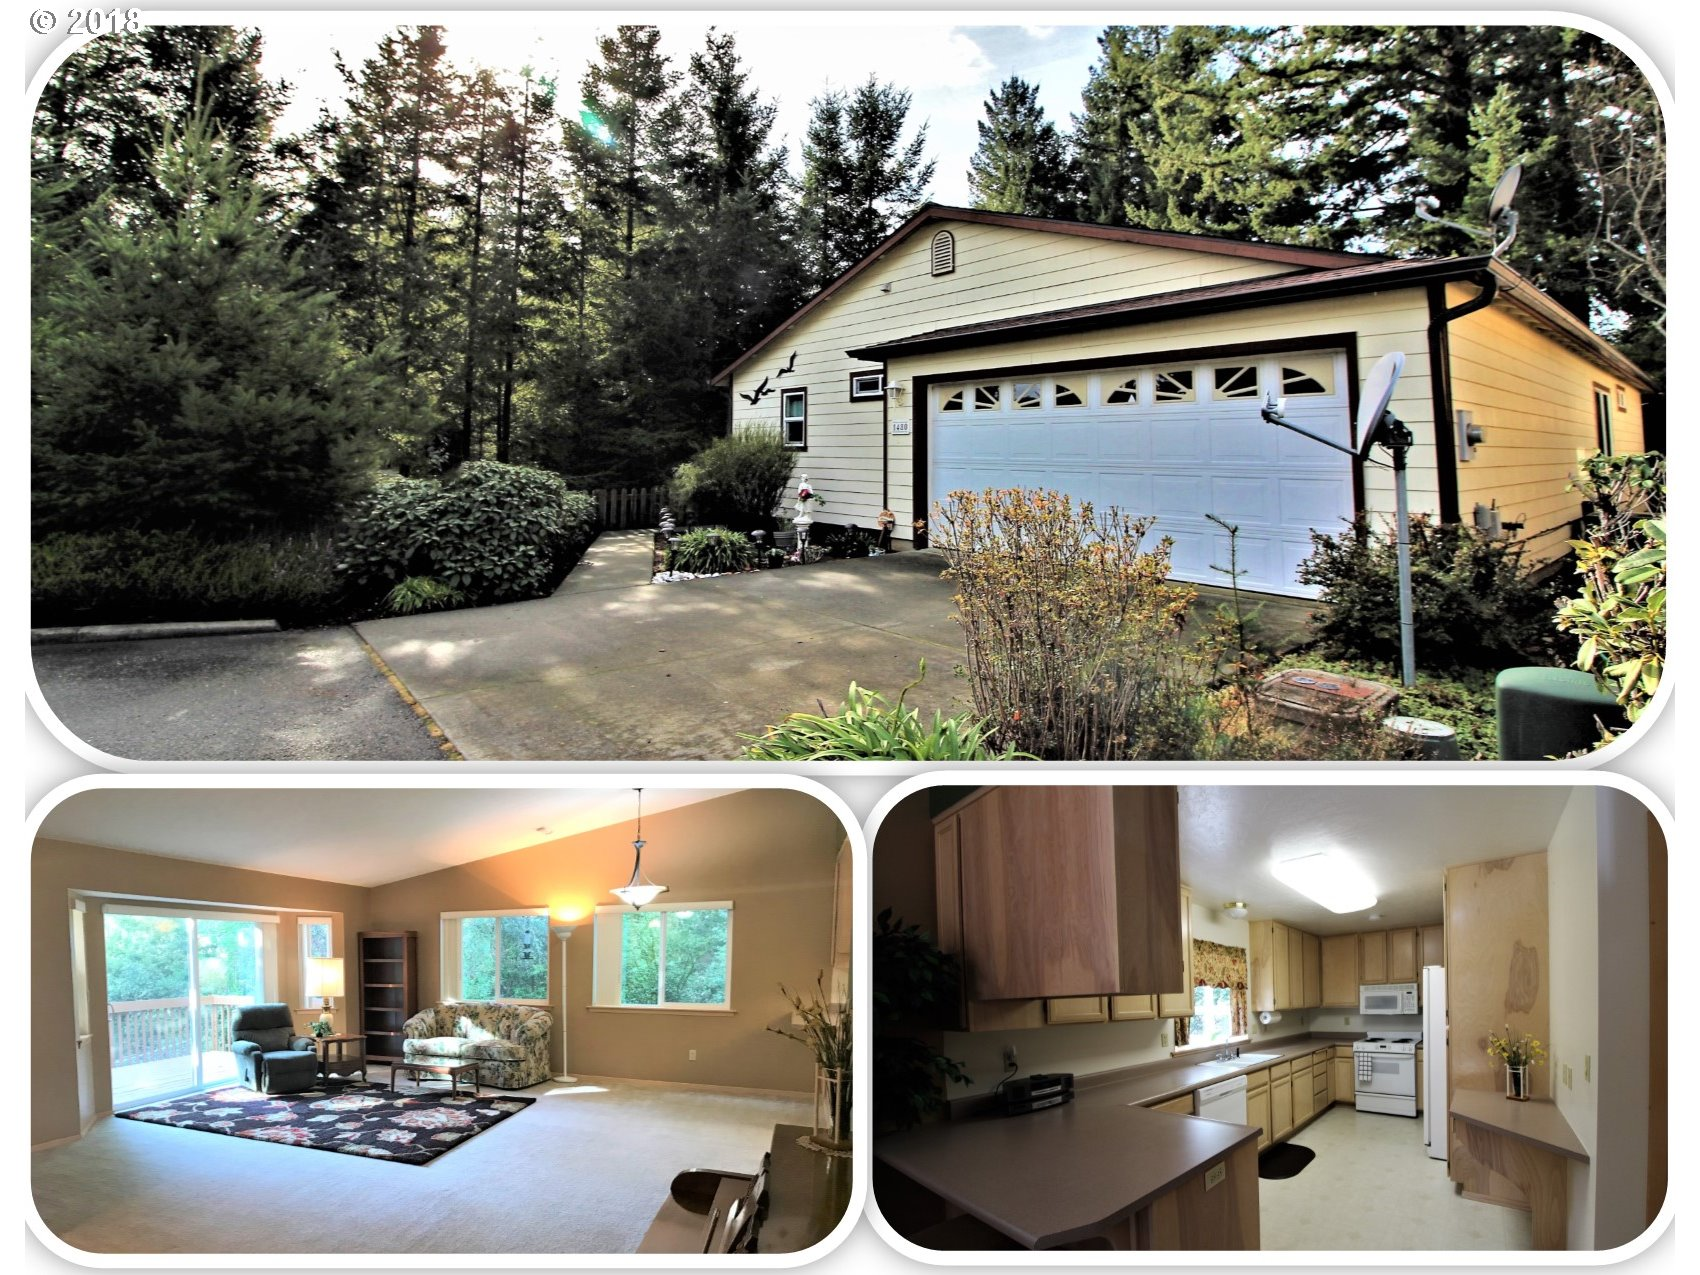 Brookings, OR 2 Bedroom Home For Sale